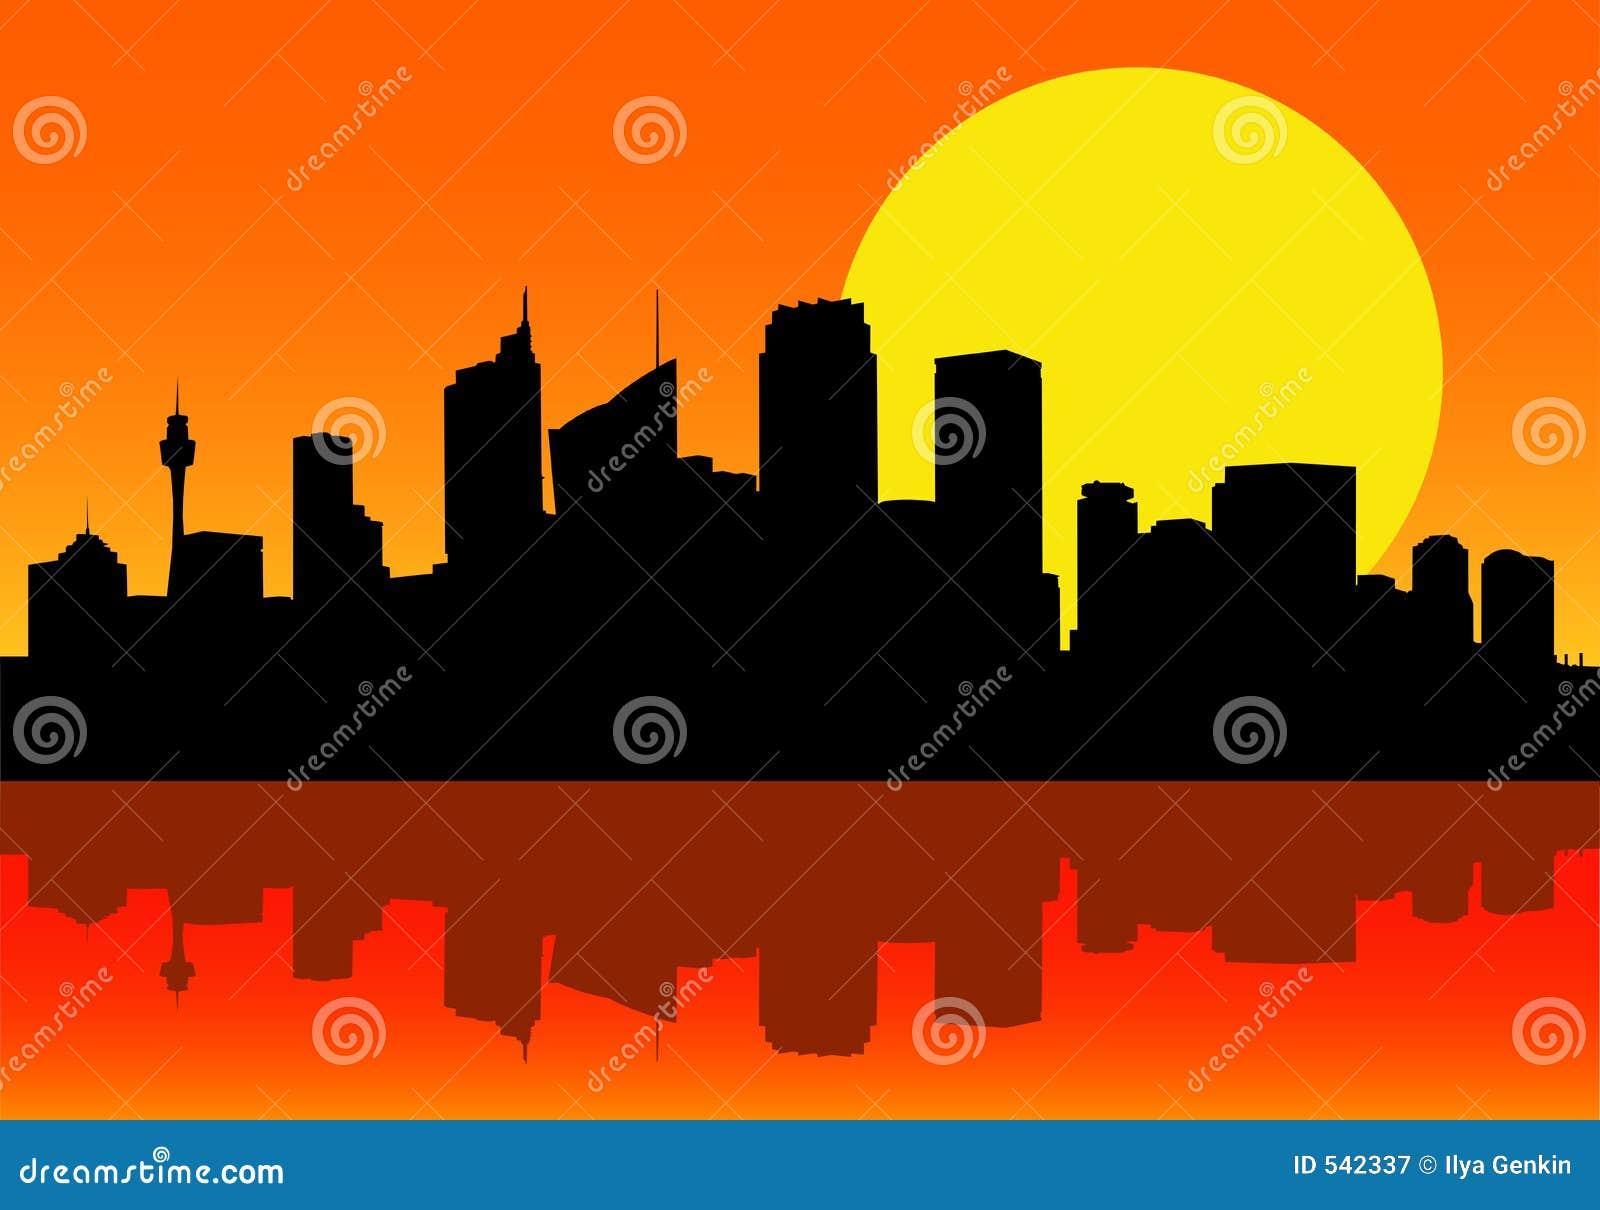 Download 城市黎明地平线 库存例证. 插画 包括有 商业, 梯度, 办公室, 无格式, 水平, 行业, 住宅, 黎明, 地铁 - 542337